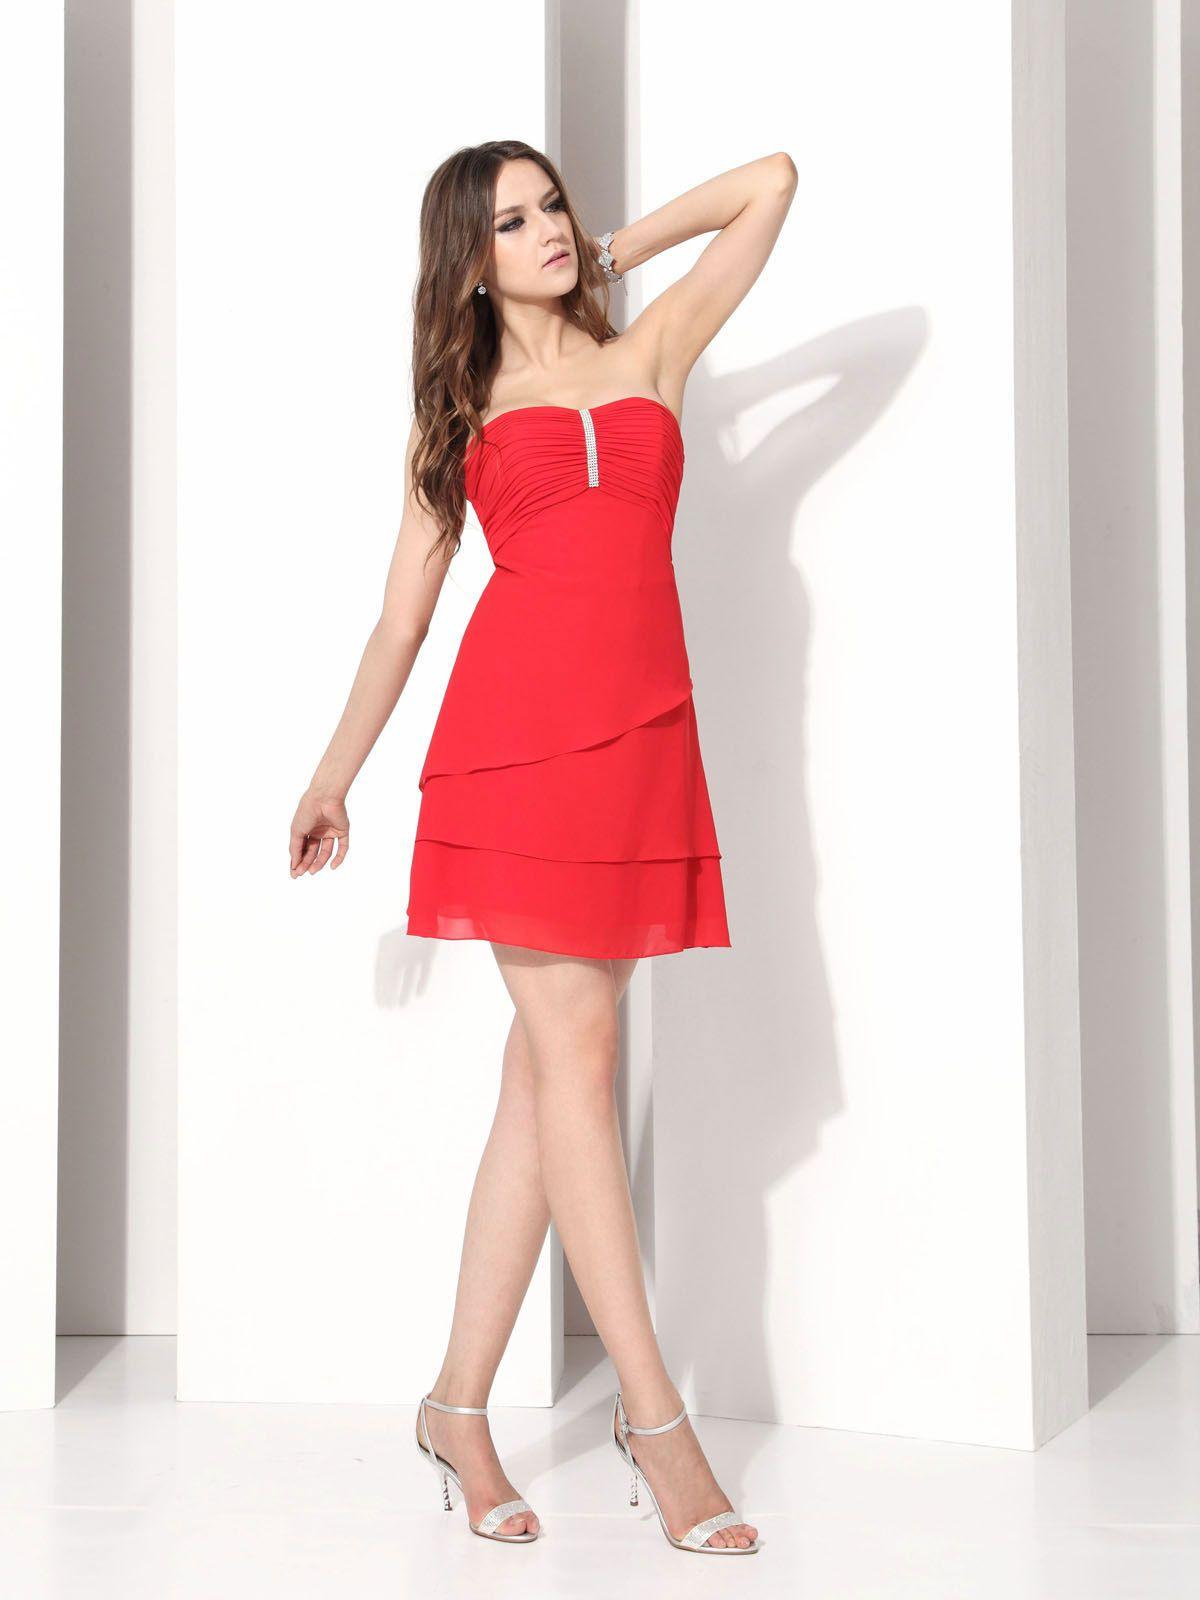 Short red bridesmaid dress hollywood dreams top 50 short red short red bridesmaid dresses beach ombrellifo Gallery